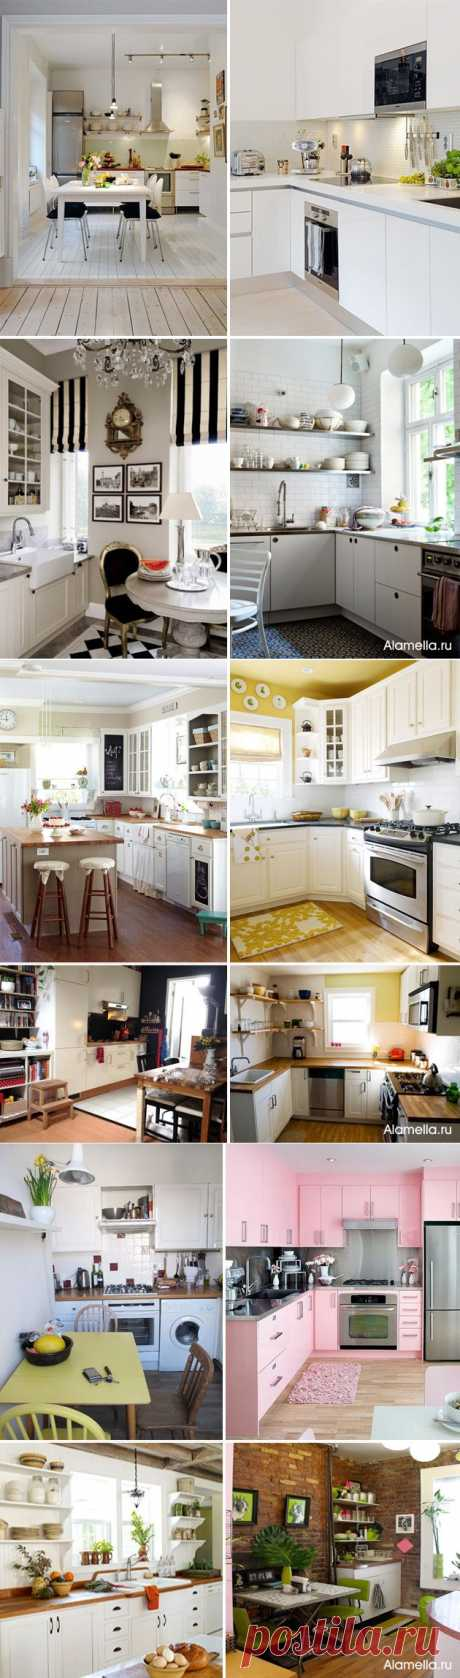 Дизайн интерьера кухни 12 кв. м. Фото | Alamella.ru